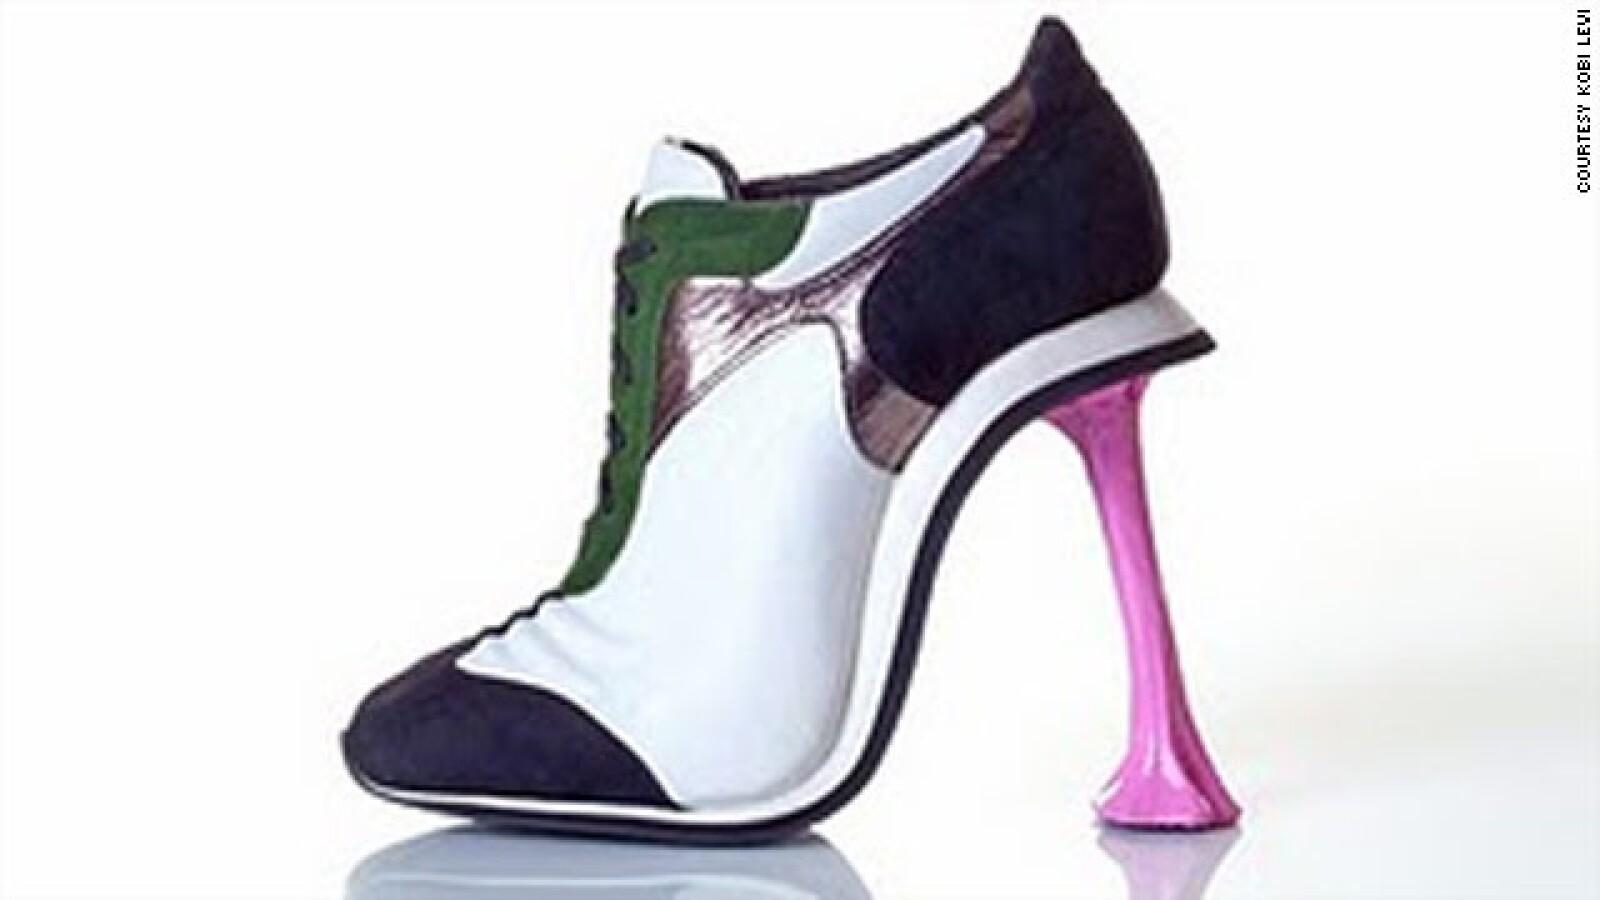 ZapatosArteCuatro